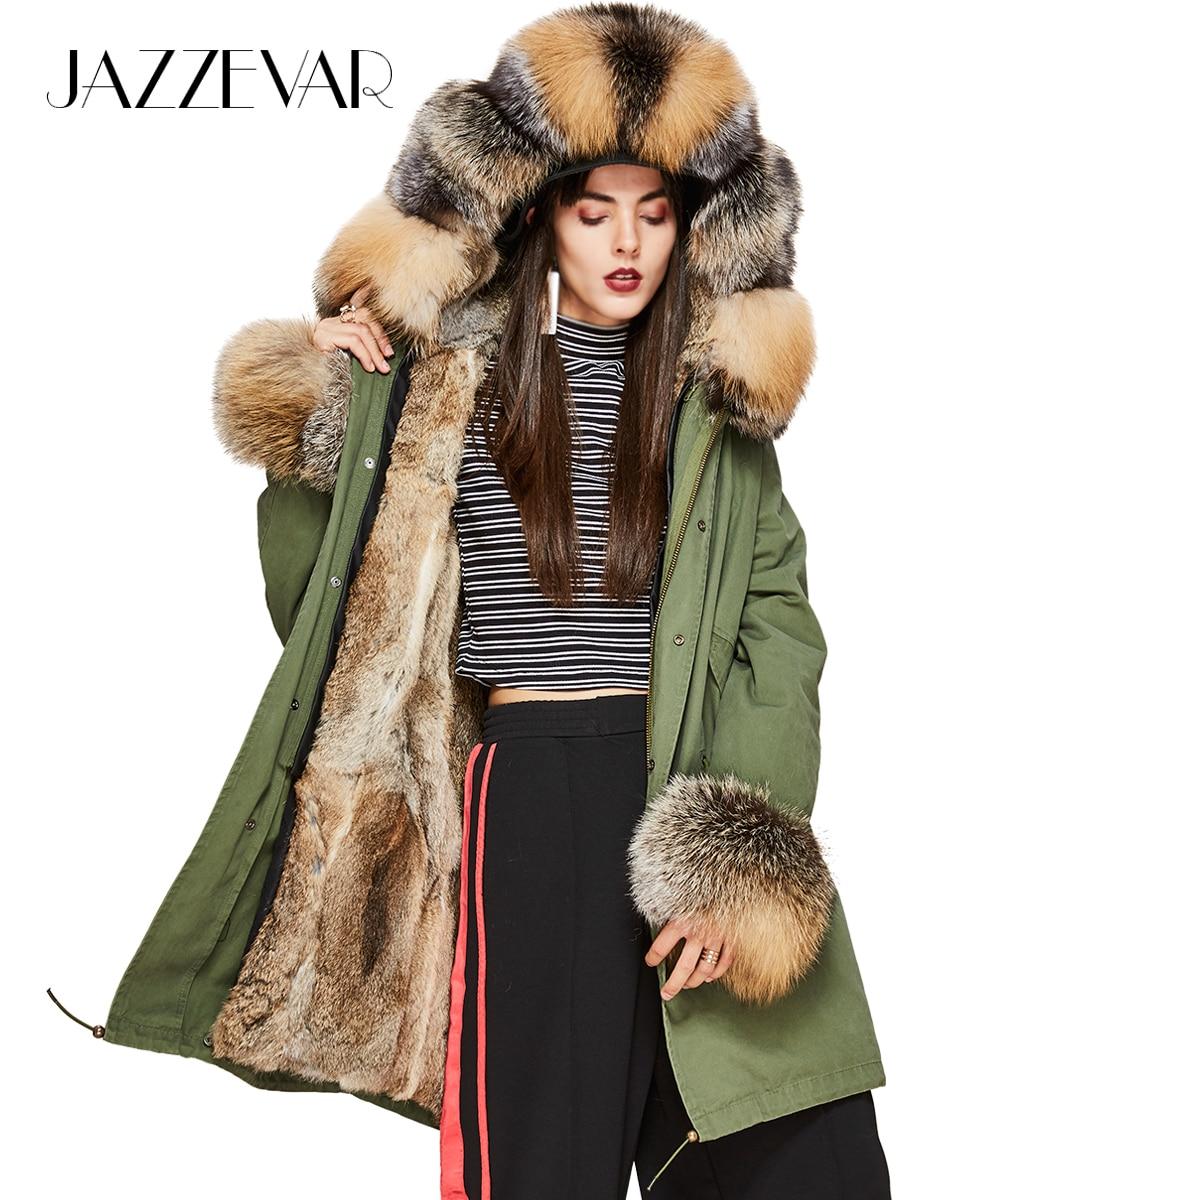 JAZZEVAR 2019 New Fashion Women's Luxurious real fox fur Collar hooded Coat Military Parkas warm rabbit lining Winter Jacket